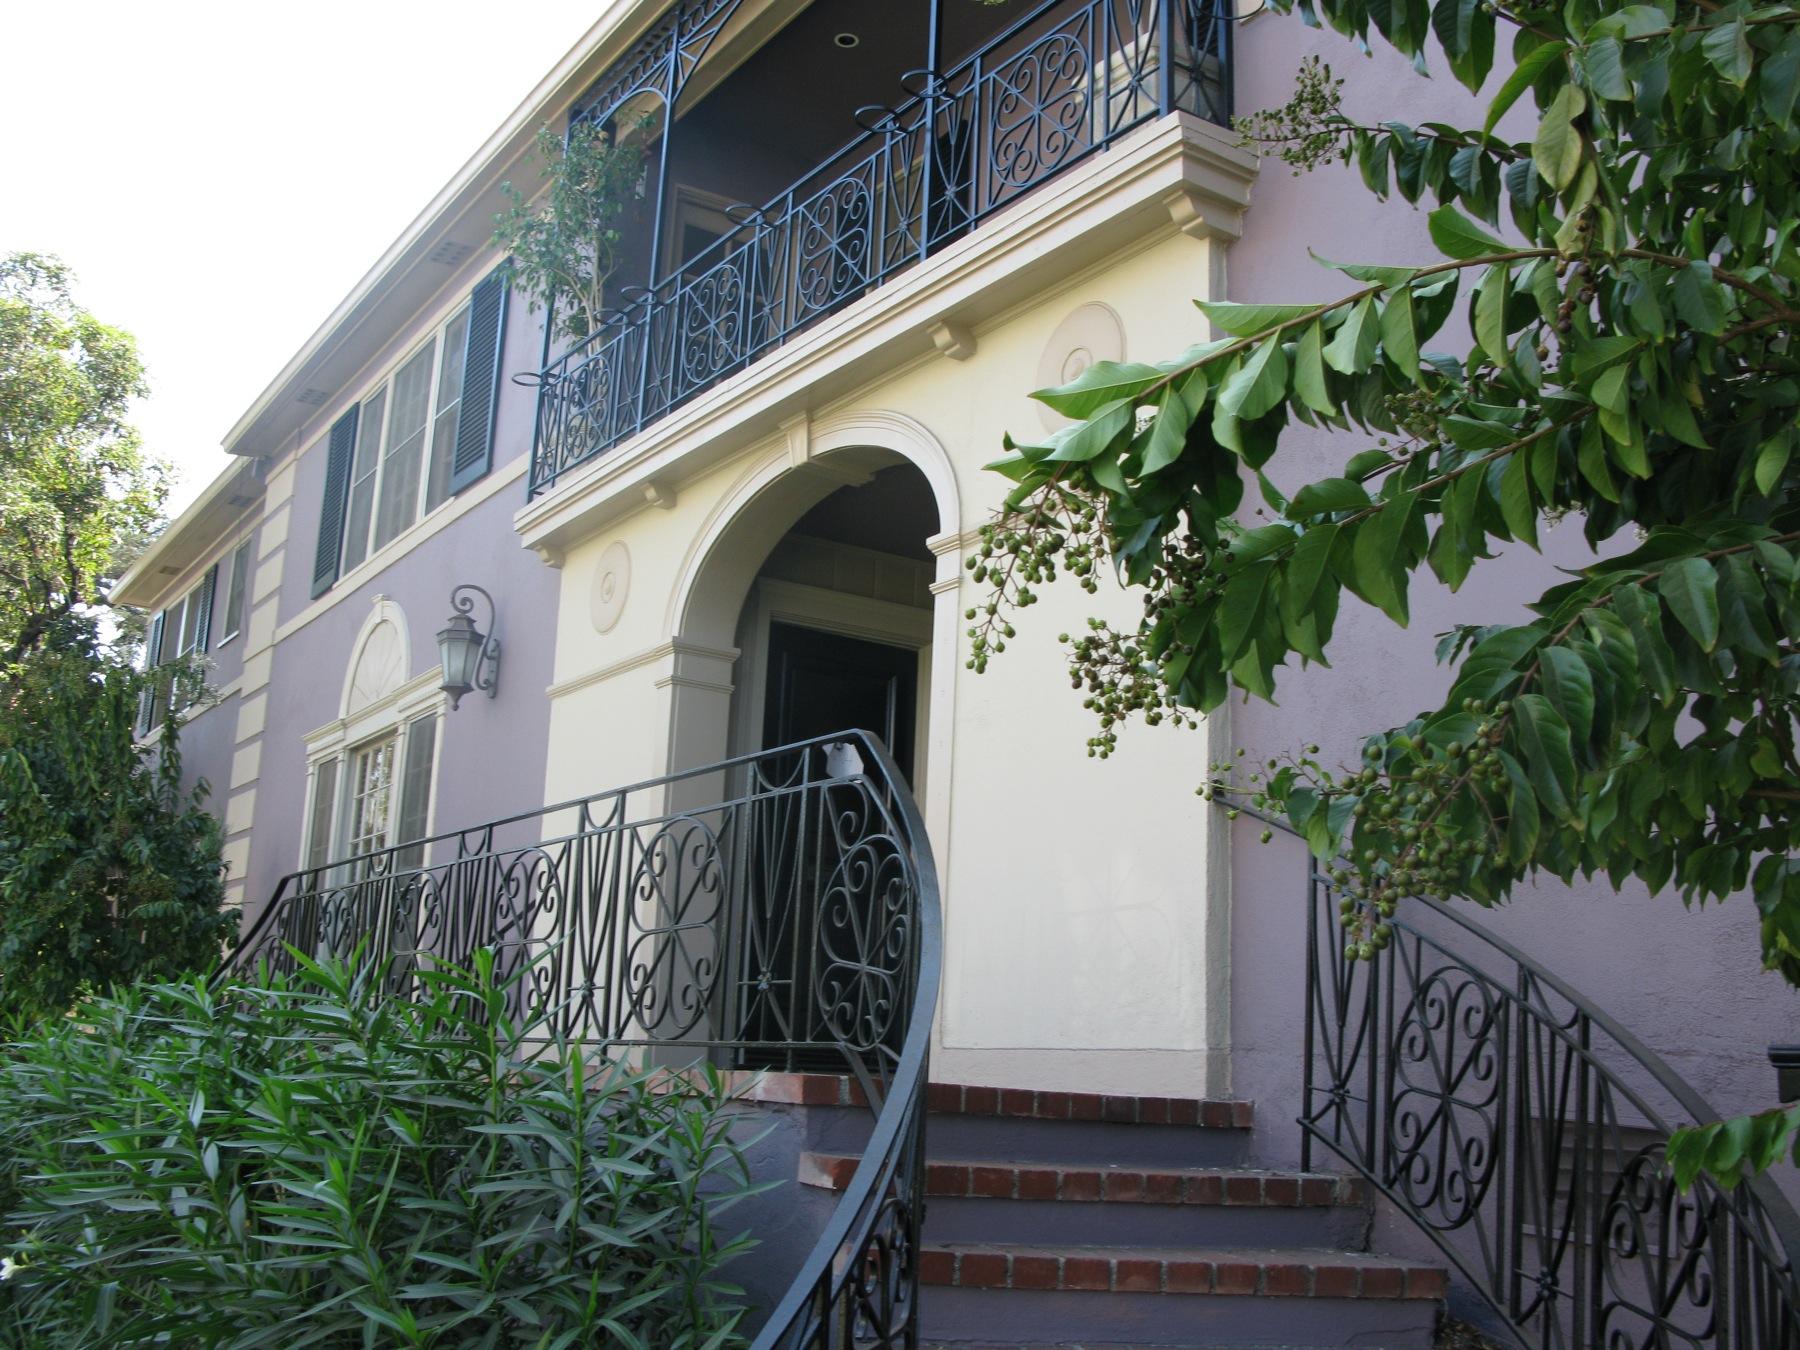 > 1 Bedroom, large, corner of Beverly & Sycamore, Hancock Park, July 1 @ 2,695